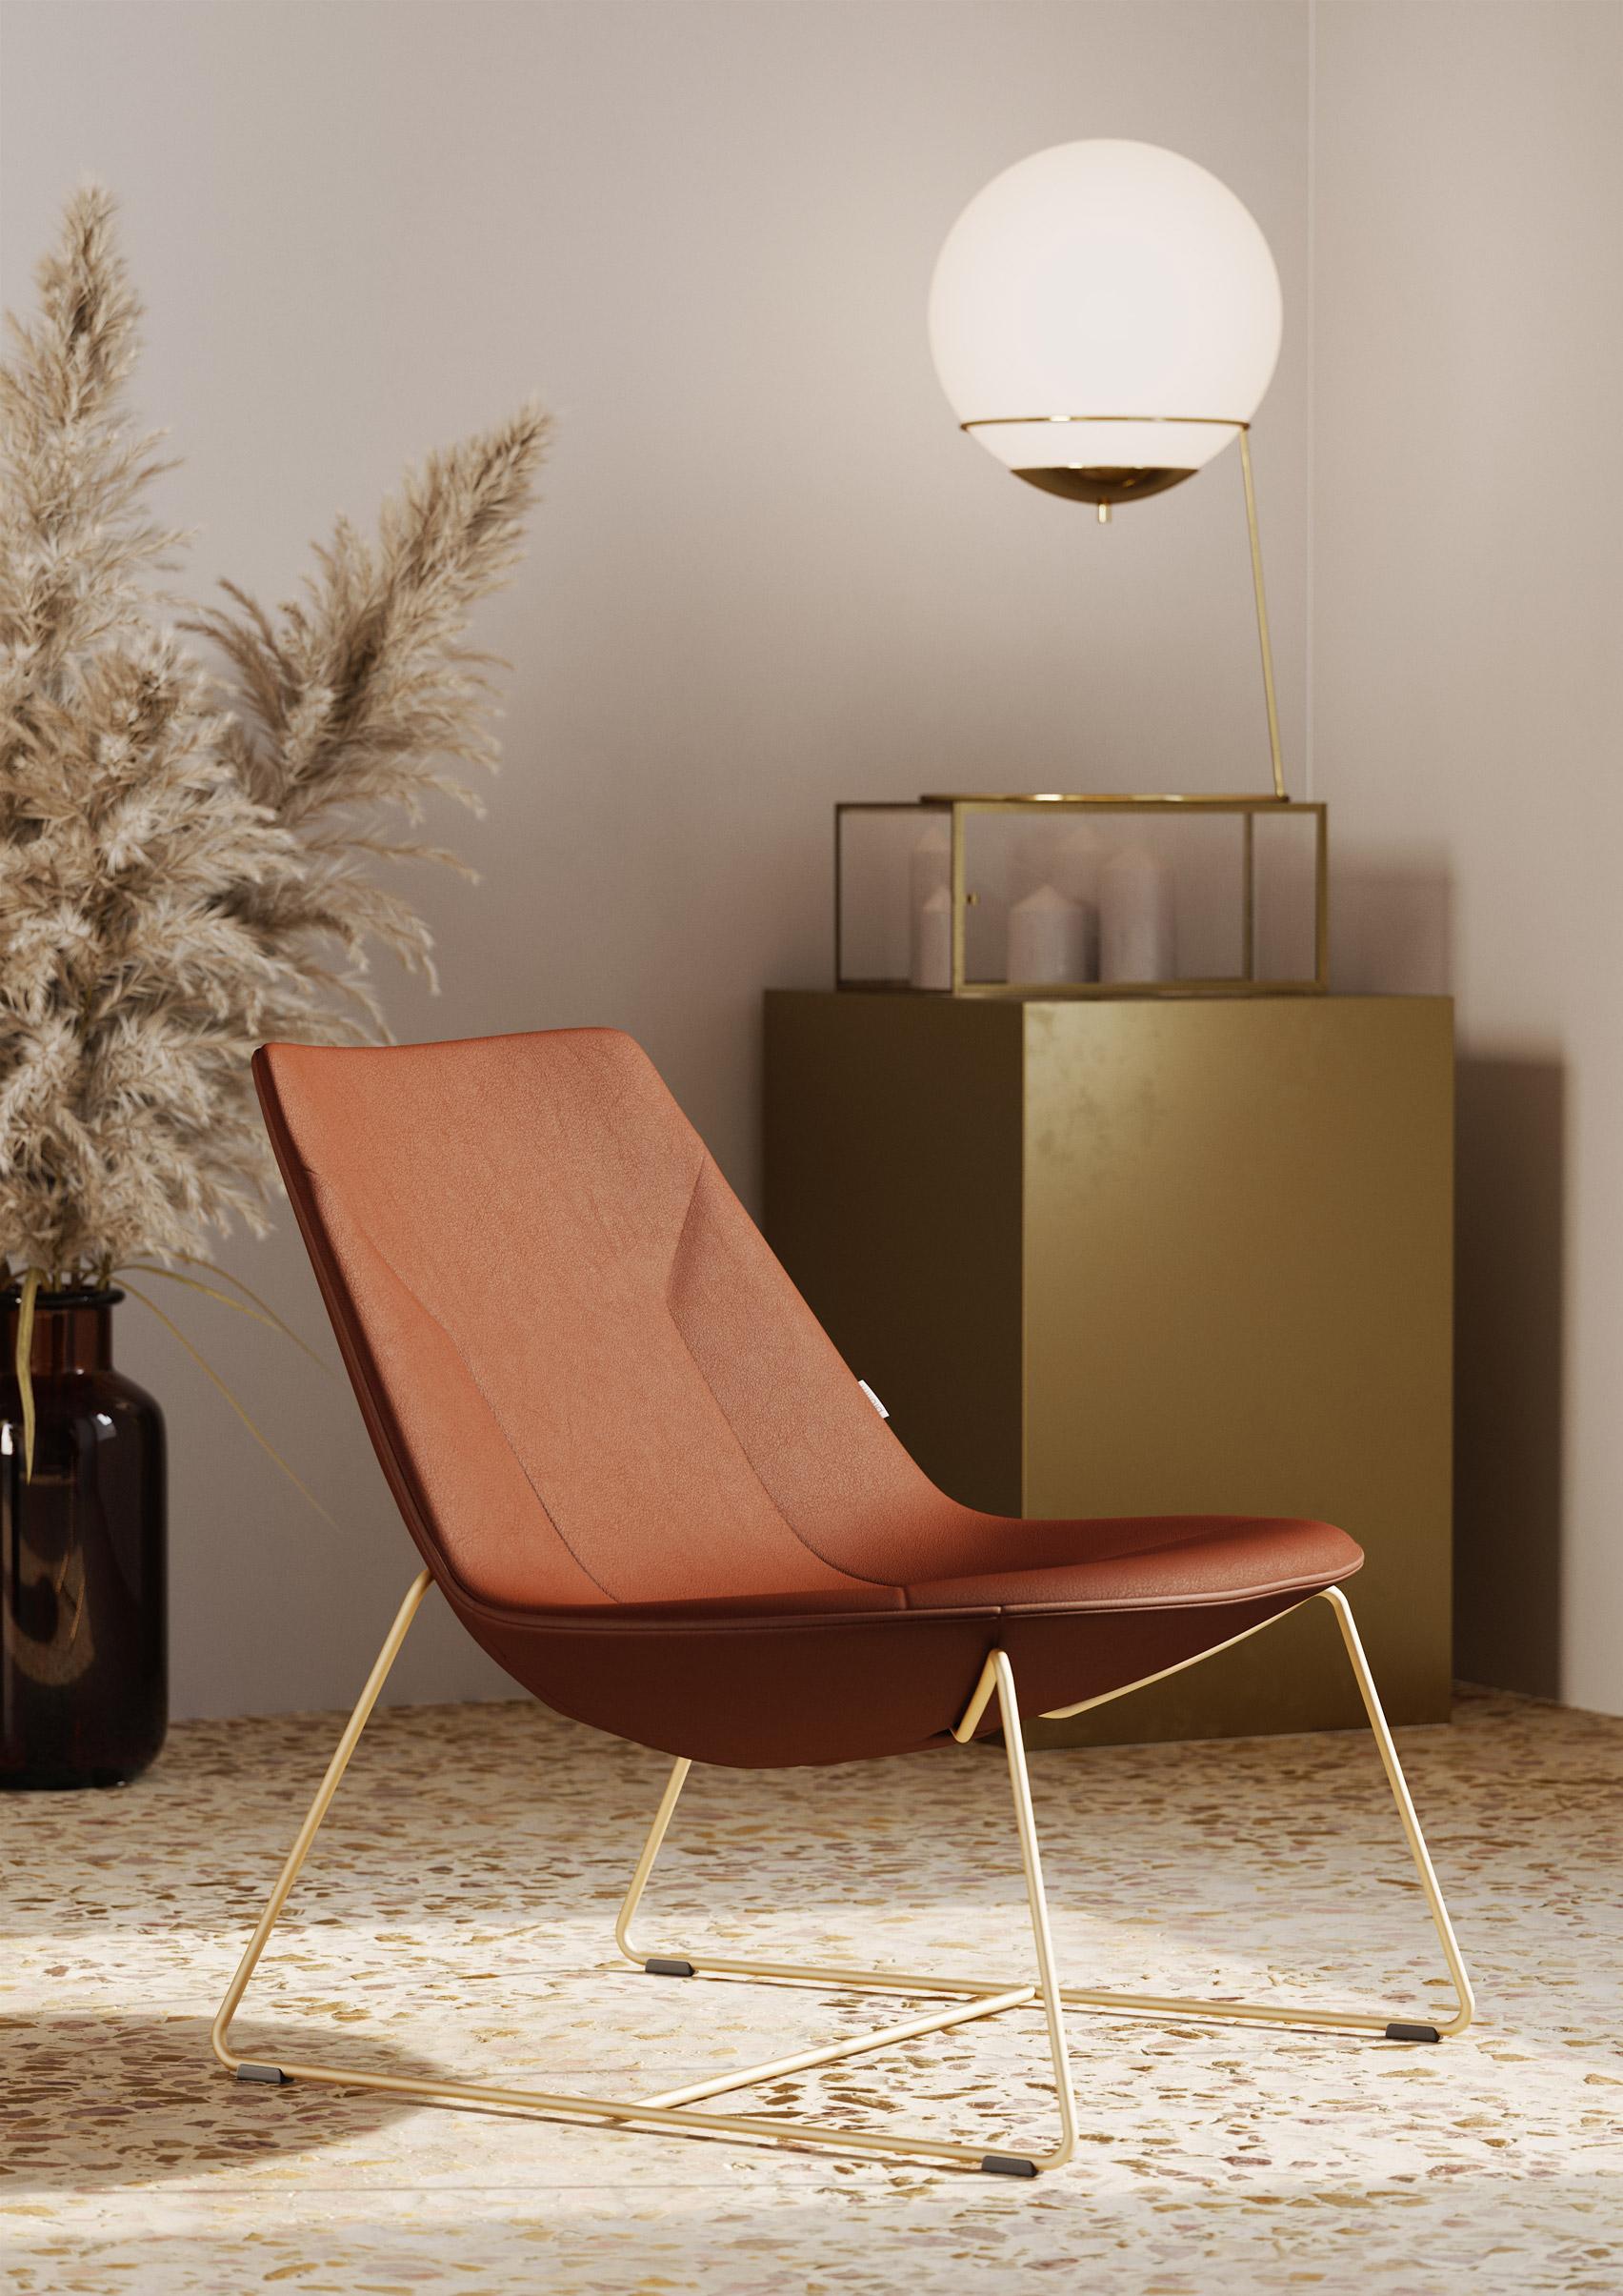 Christophe Pillet designs chair for Profim